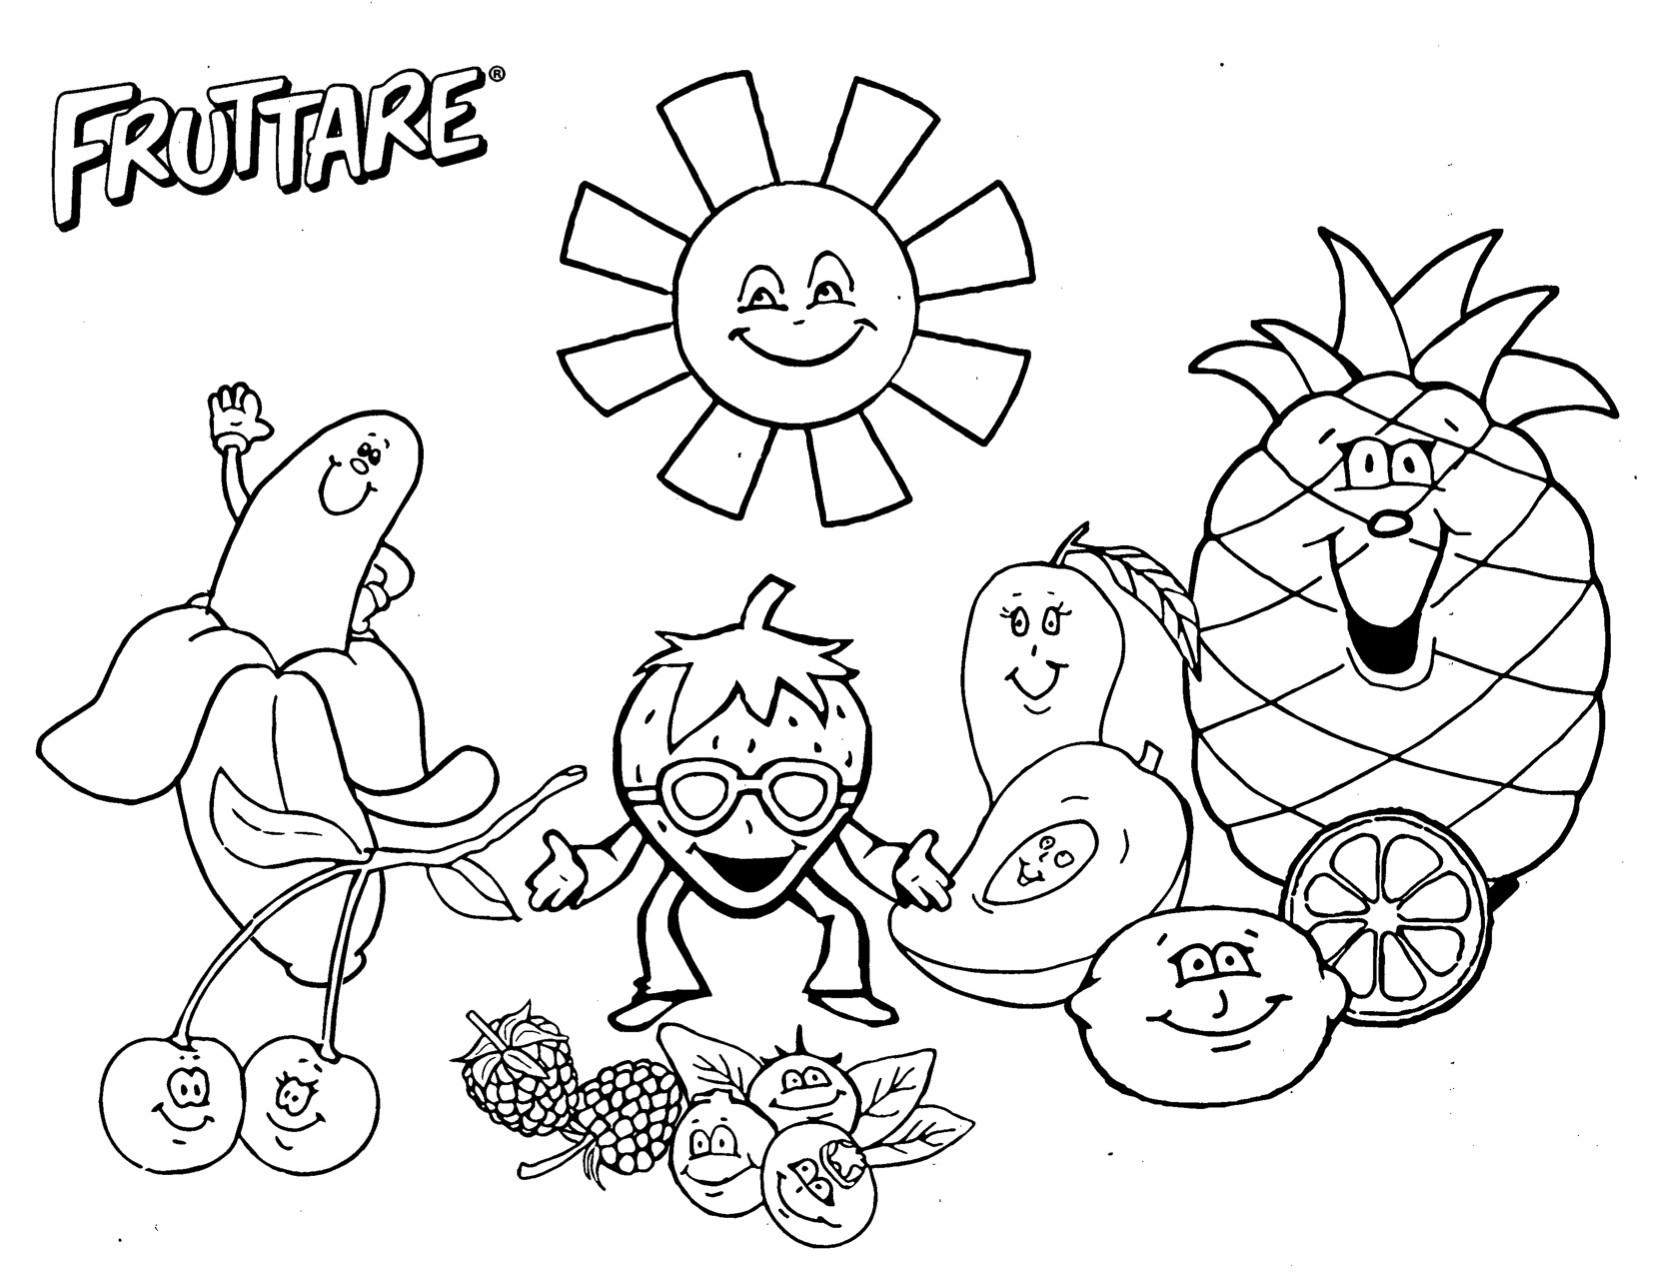 5 Fun Fruit Activities For Families